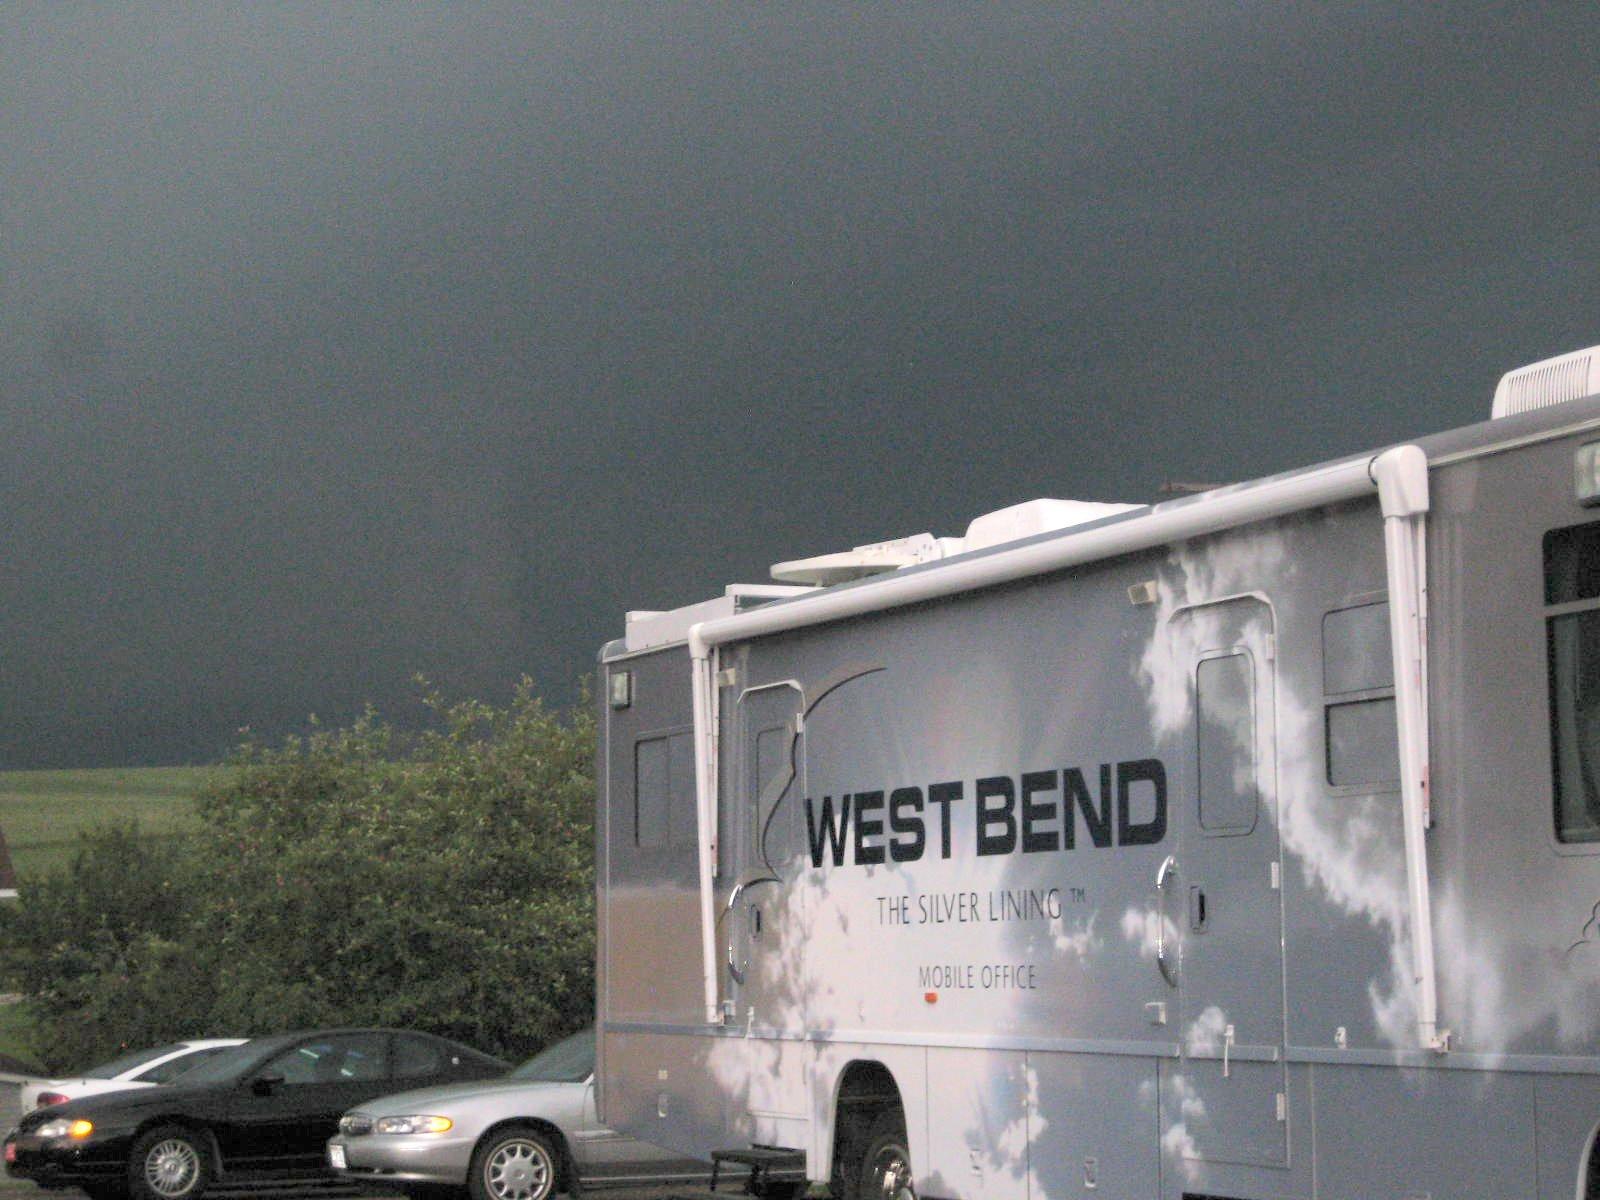 Responder in Tornado